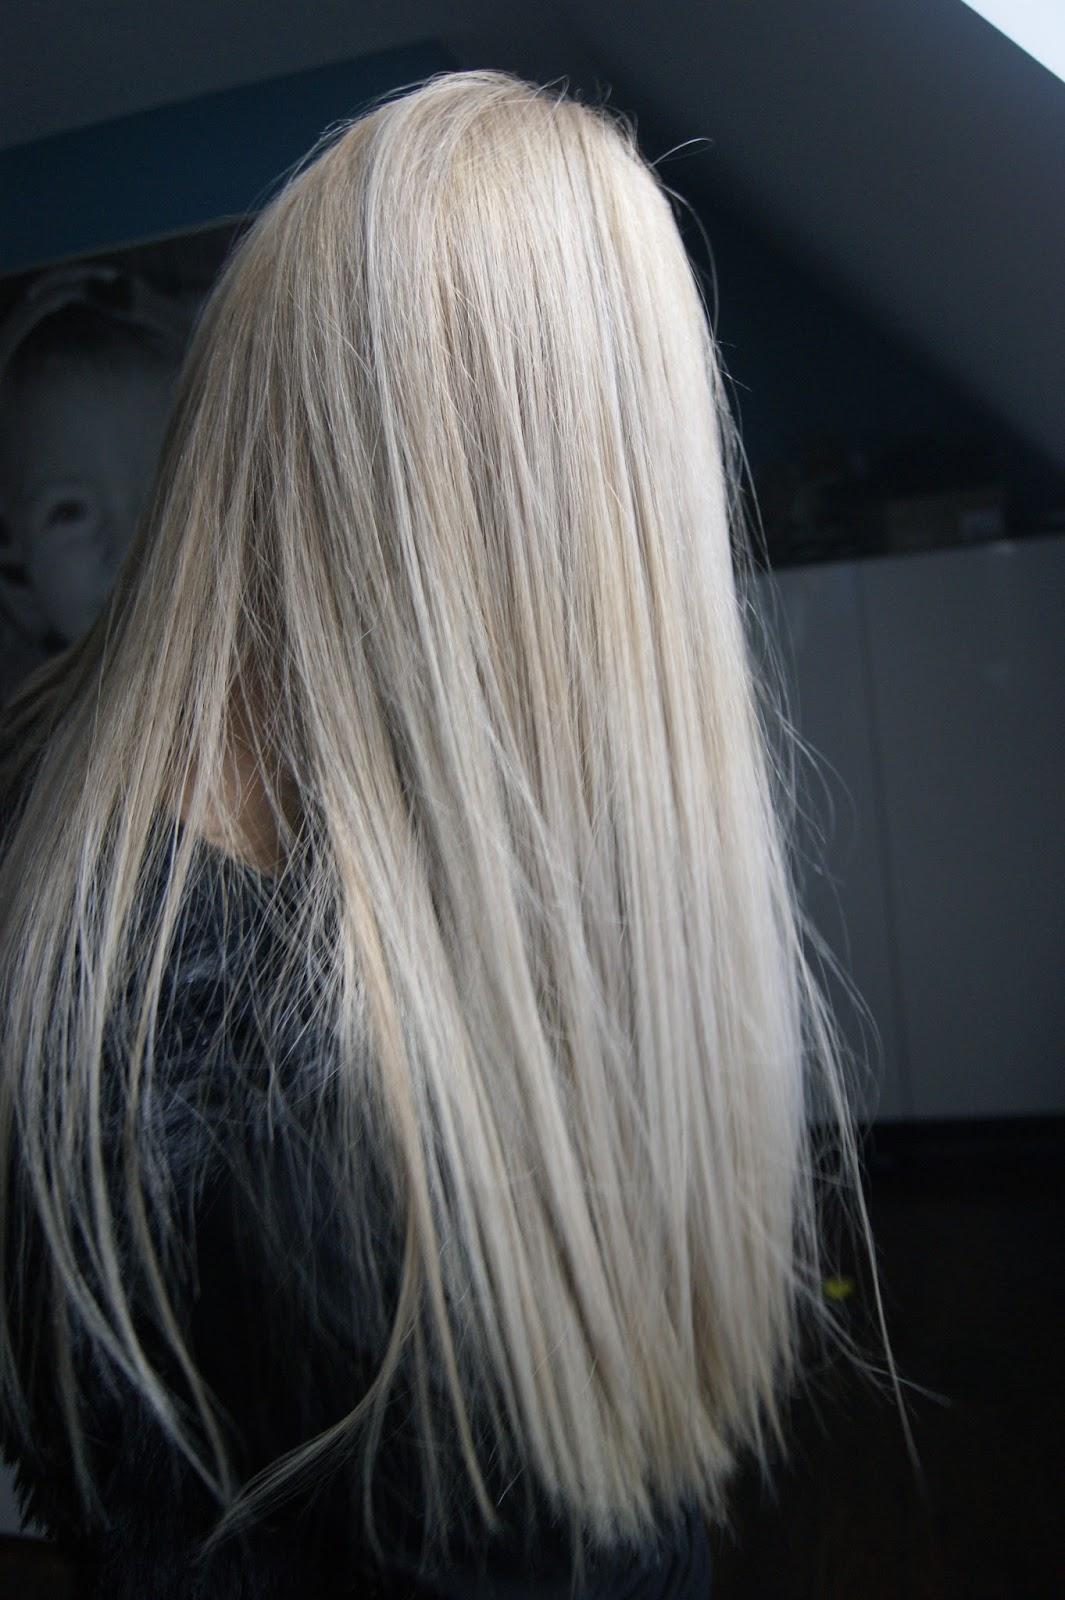 Perłowy Chłodny Blond Pauli 3 Andy Solecki Hair Artist